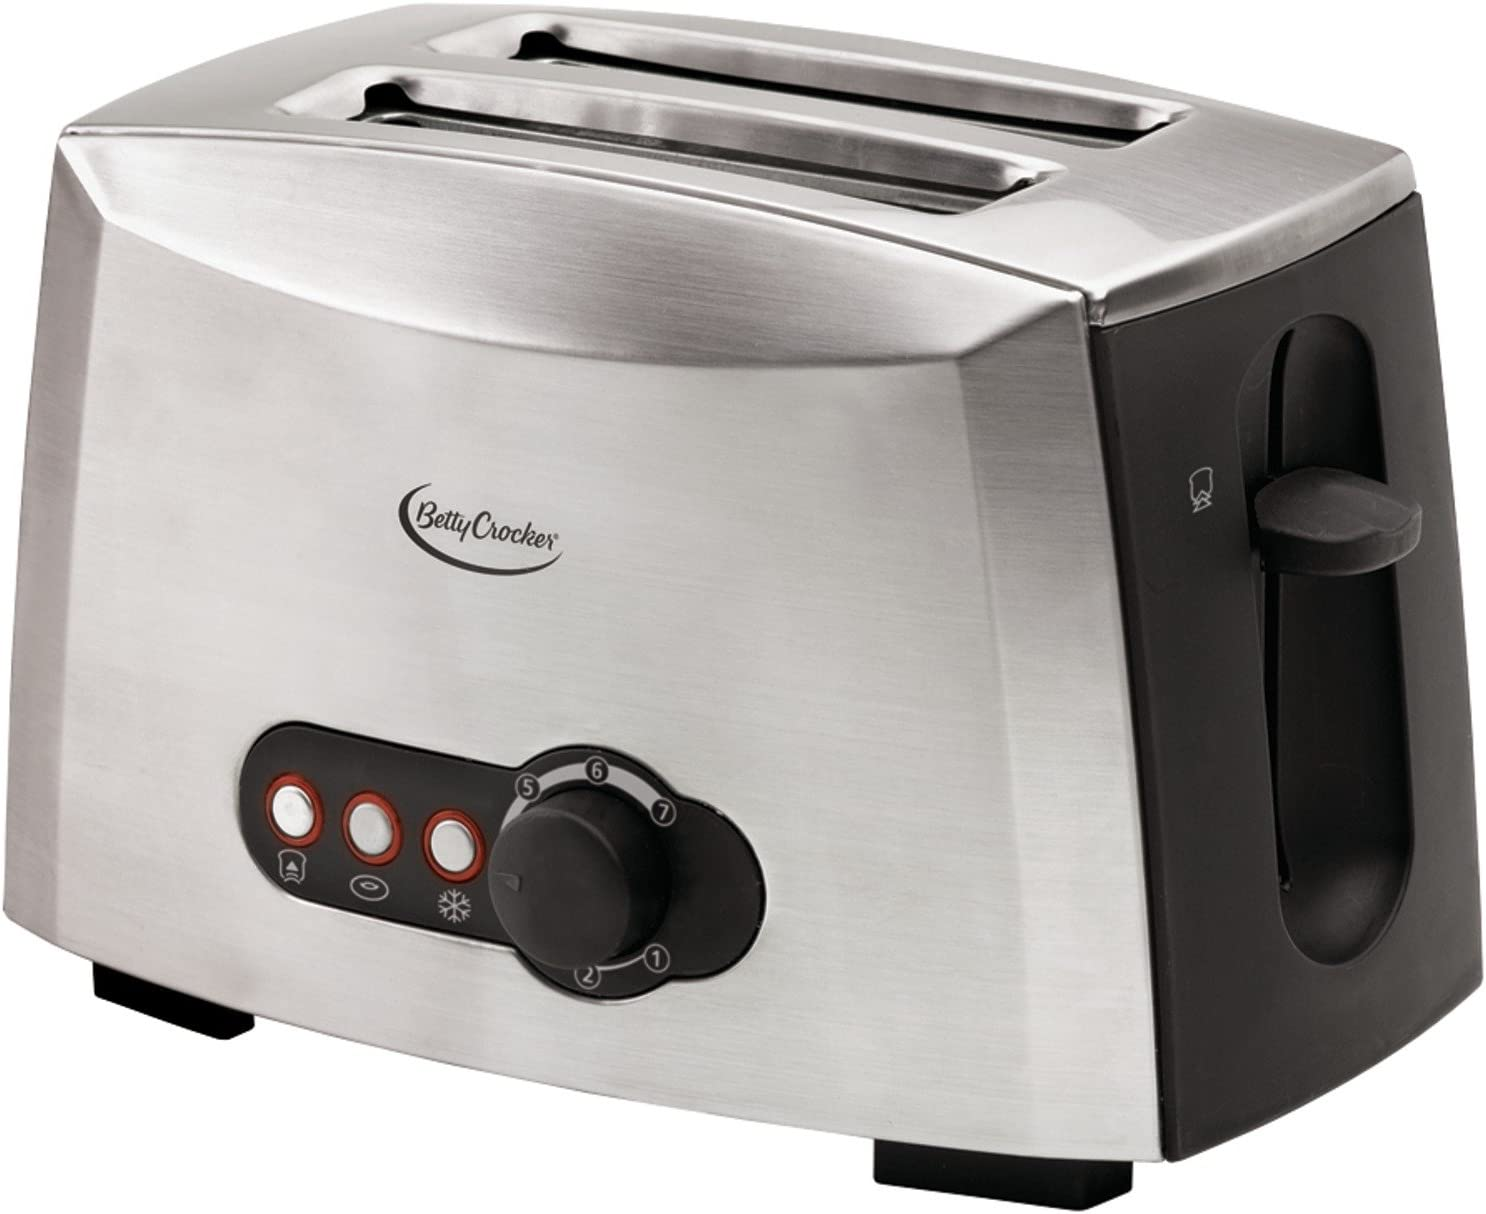 Betty Crocker 2-Slice Multifunctional Brushed Stainless Toaster 2021 Very popular!